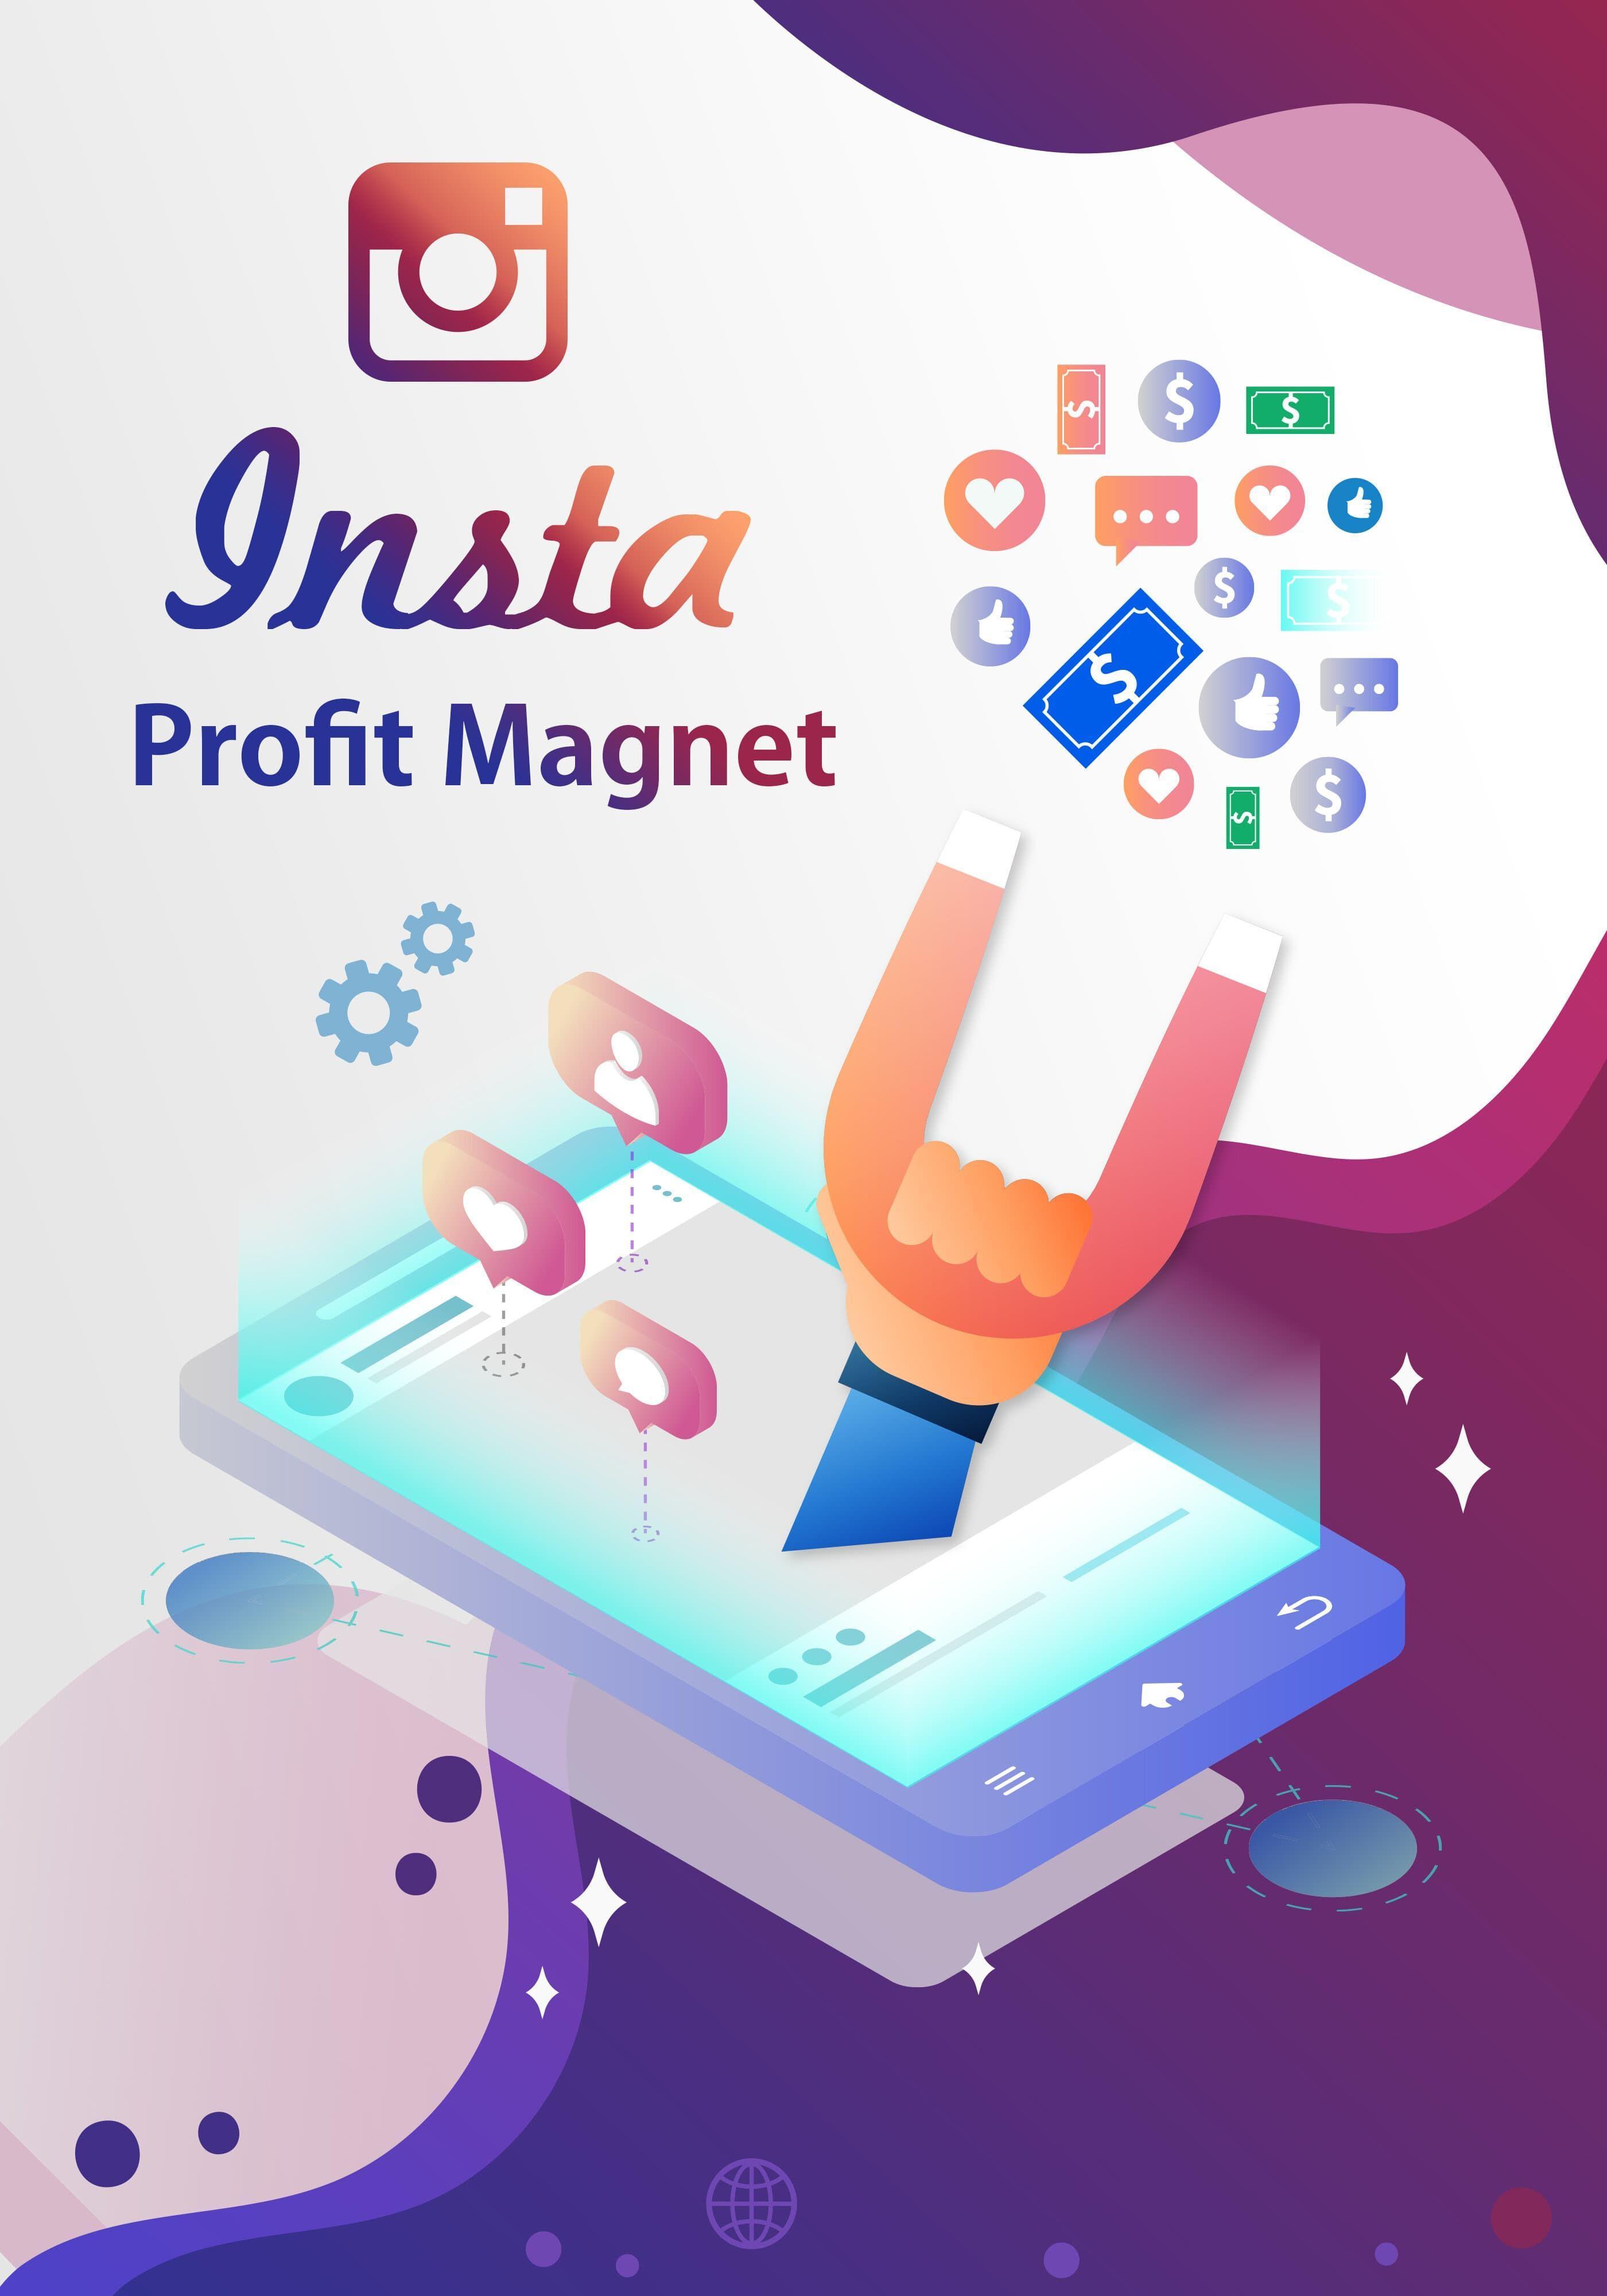 Insta Profit Magnet eBook's Book Image